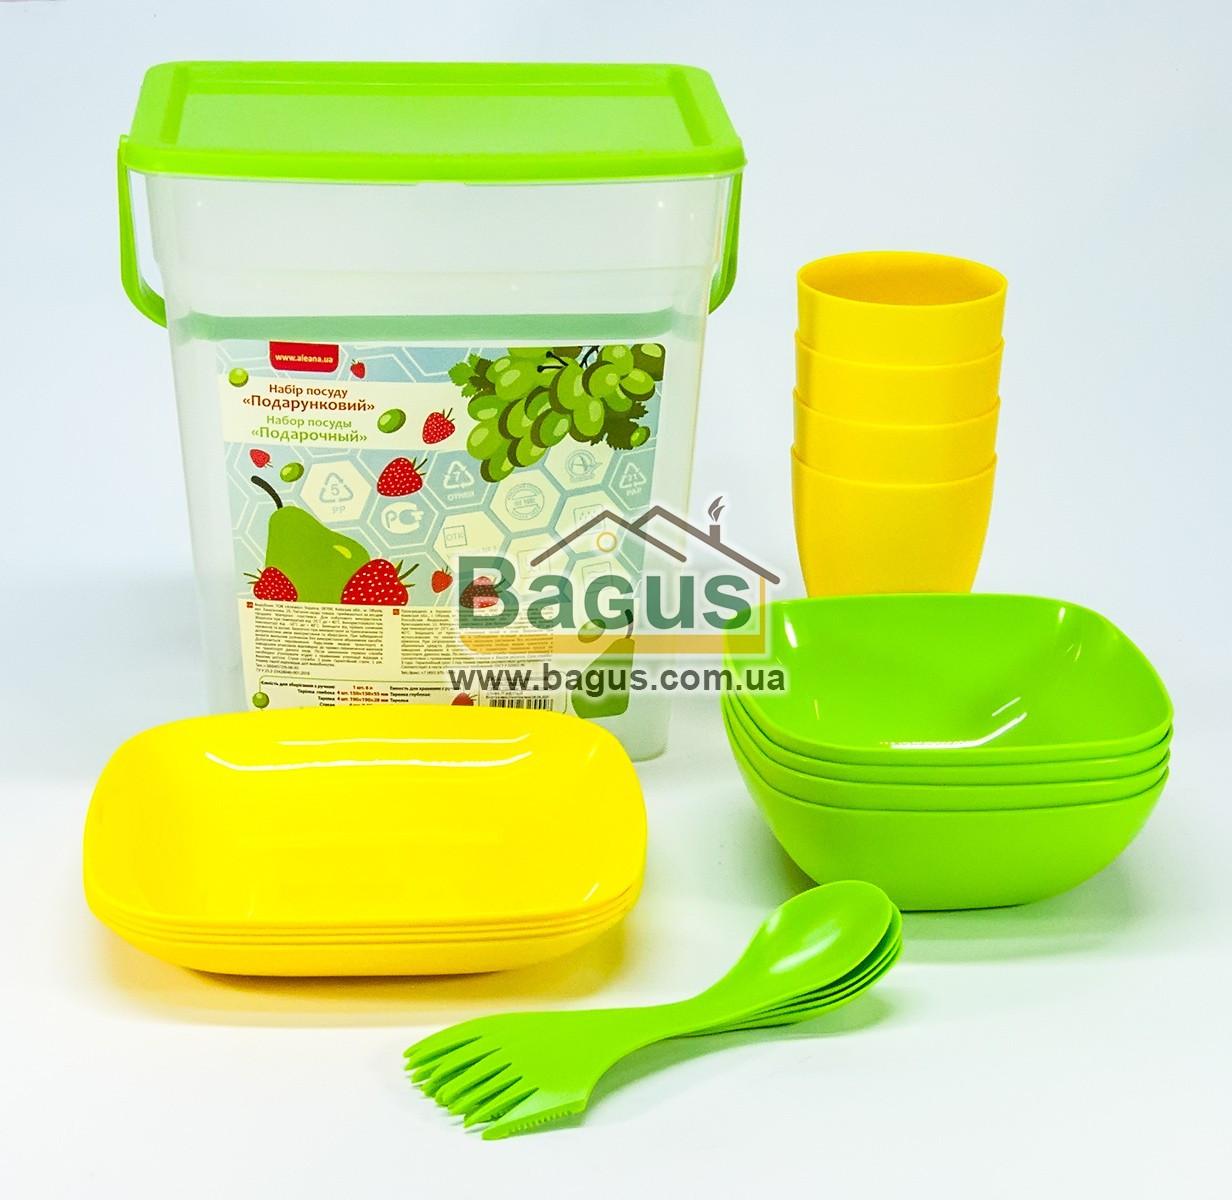 Набор посуды для пикника (ведро + 4 комплекта посуды) (цвет желто-салатовый) Алеана ALN-169042-2